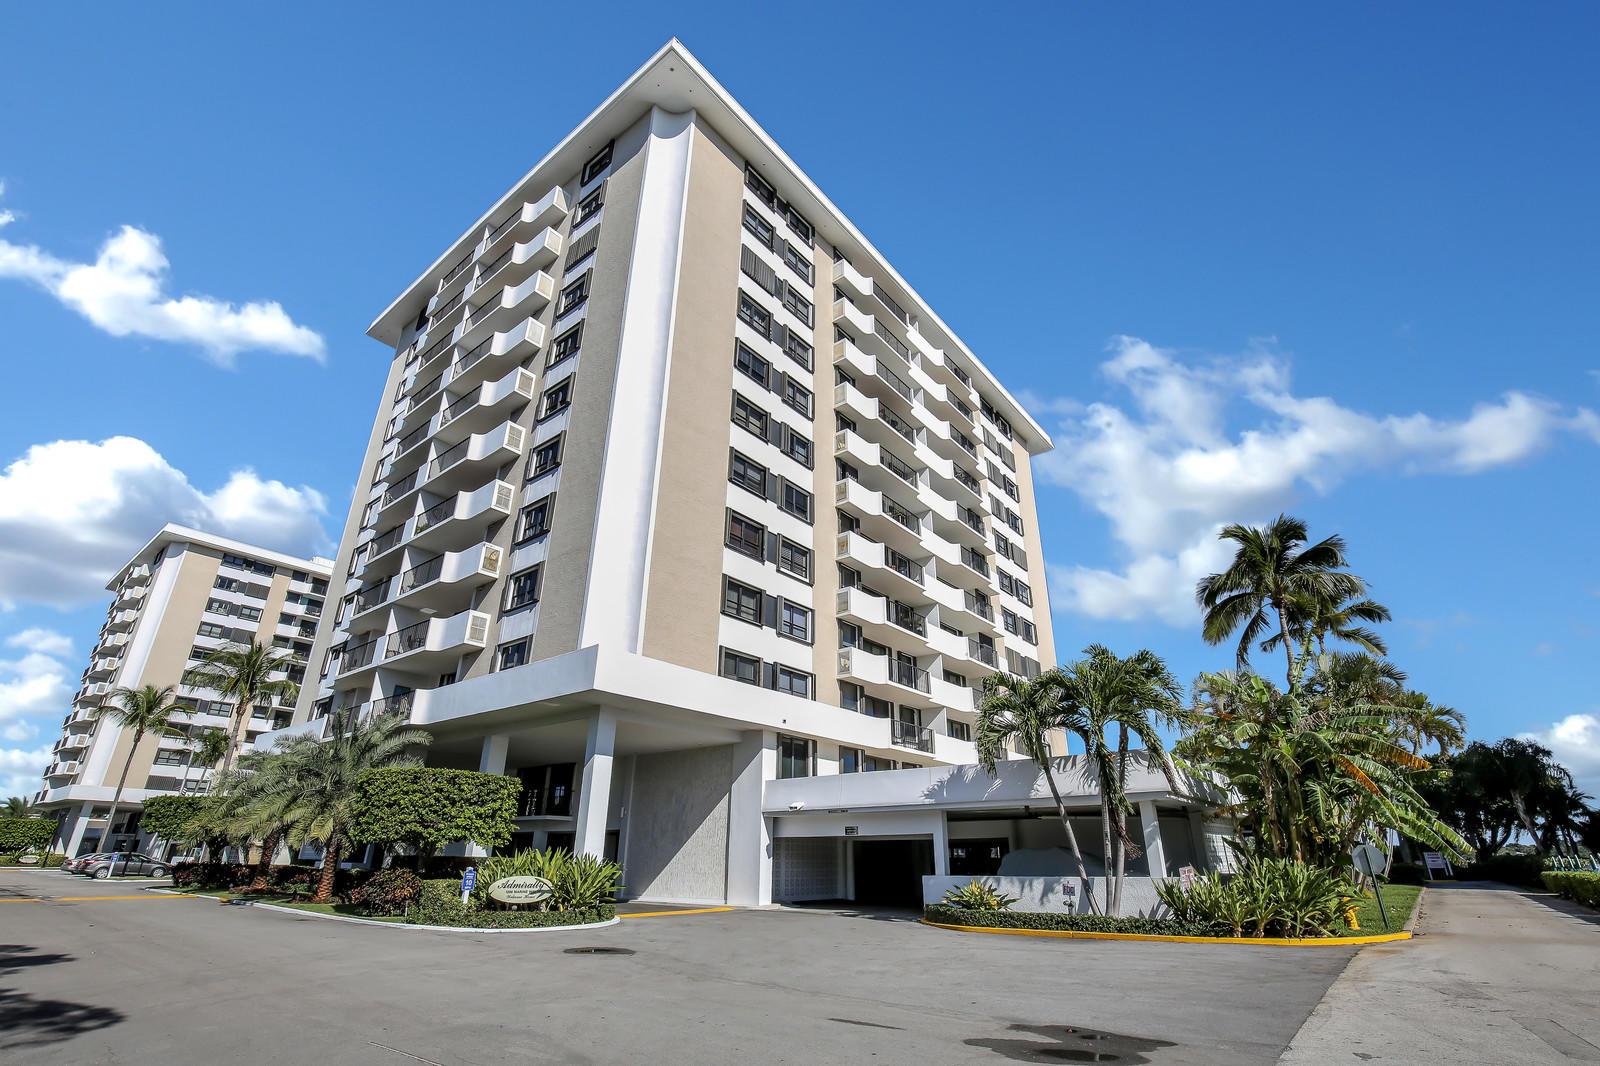 1200 Marine Unit 909 Ph 1, North Palm Beach, Florida 33408